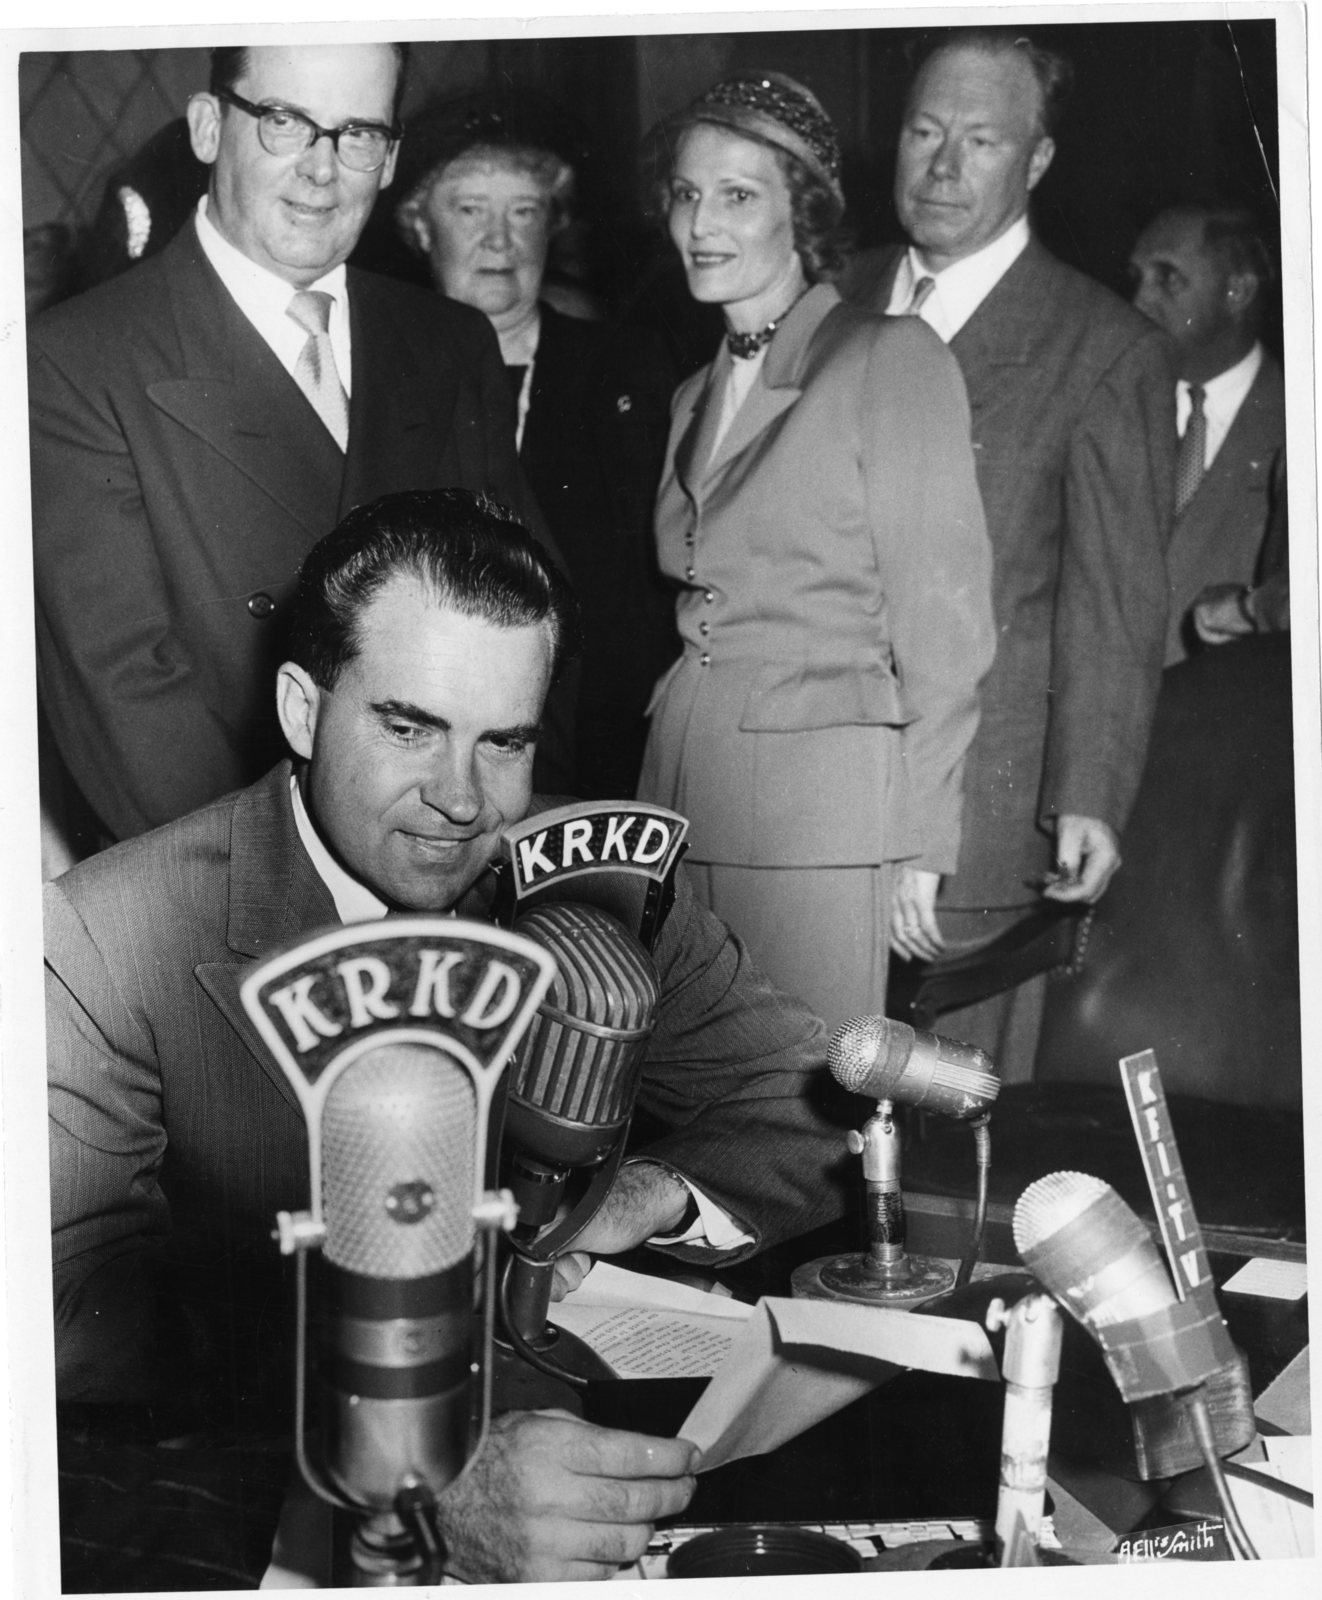 Richard Nixon delivers a radio speech at KRKD Radio in Los Angeles